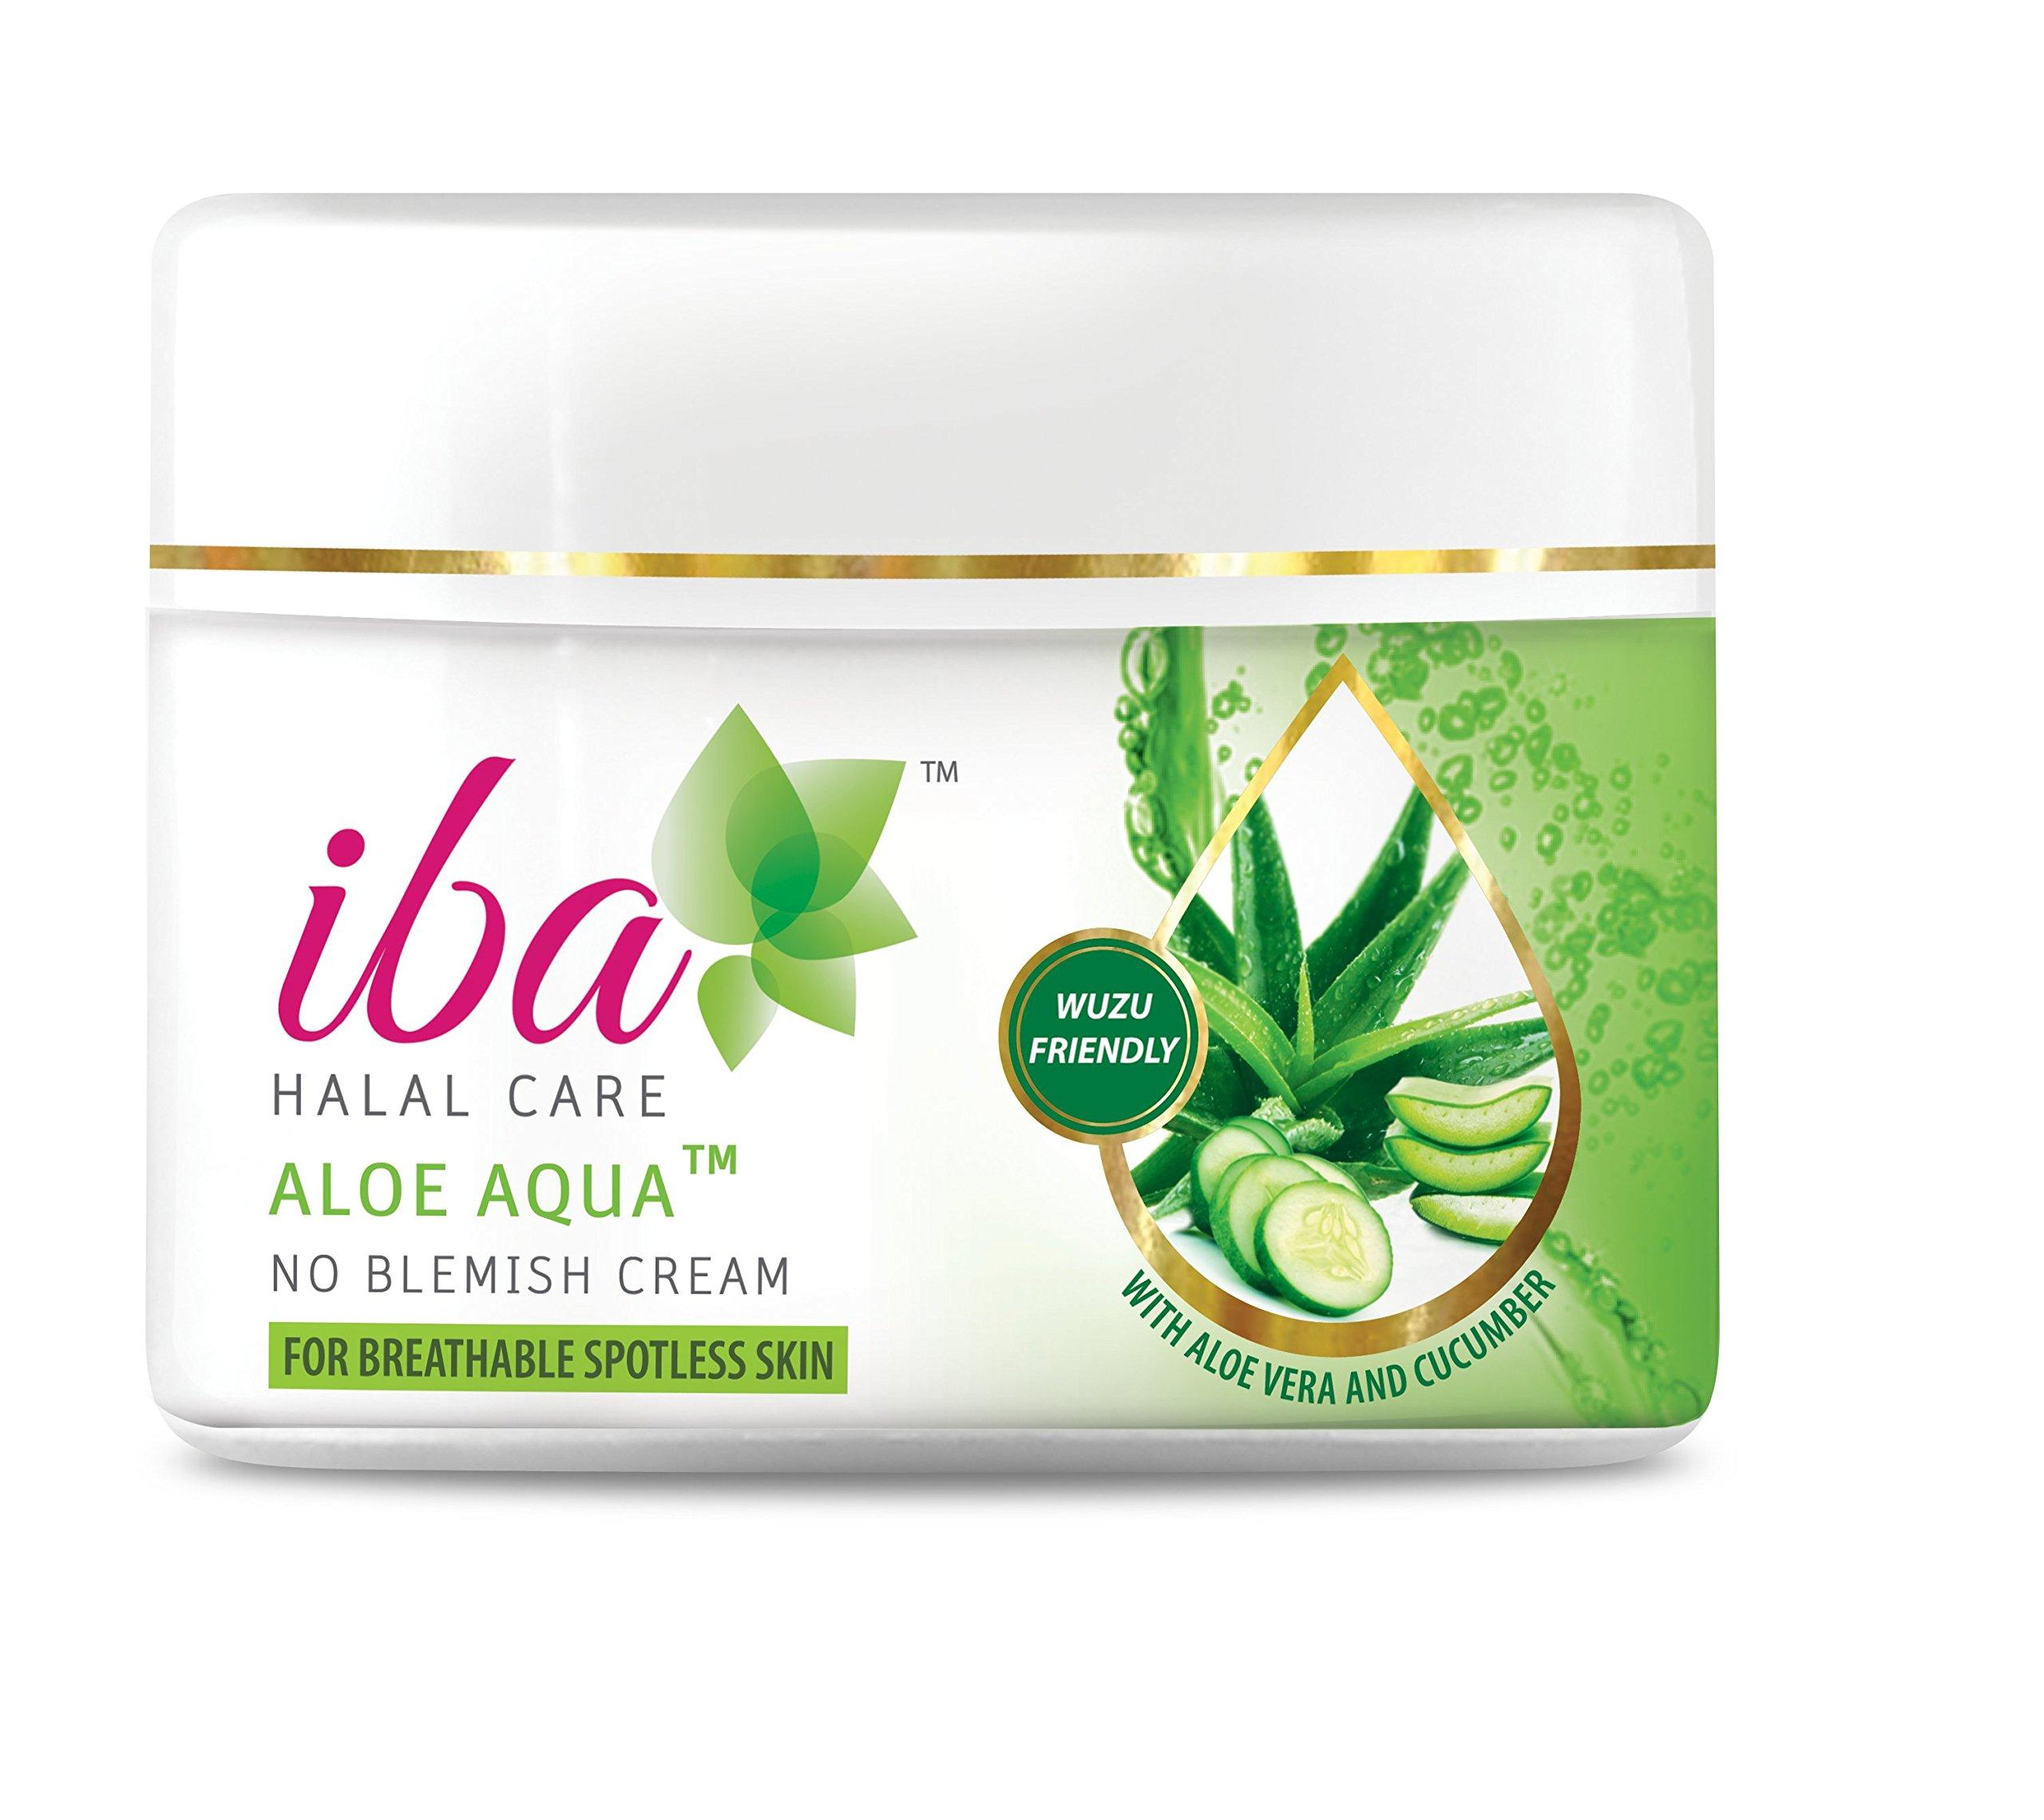 Iba Halal Care Aloe Aqua No Blemish Cream, 50g